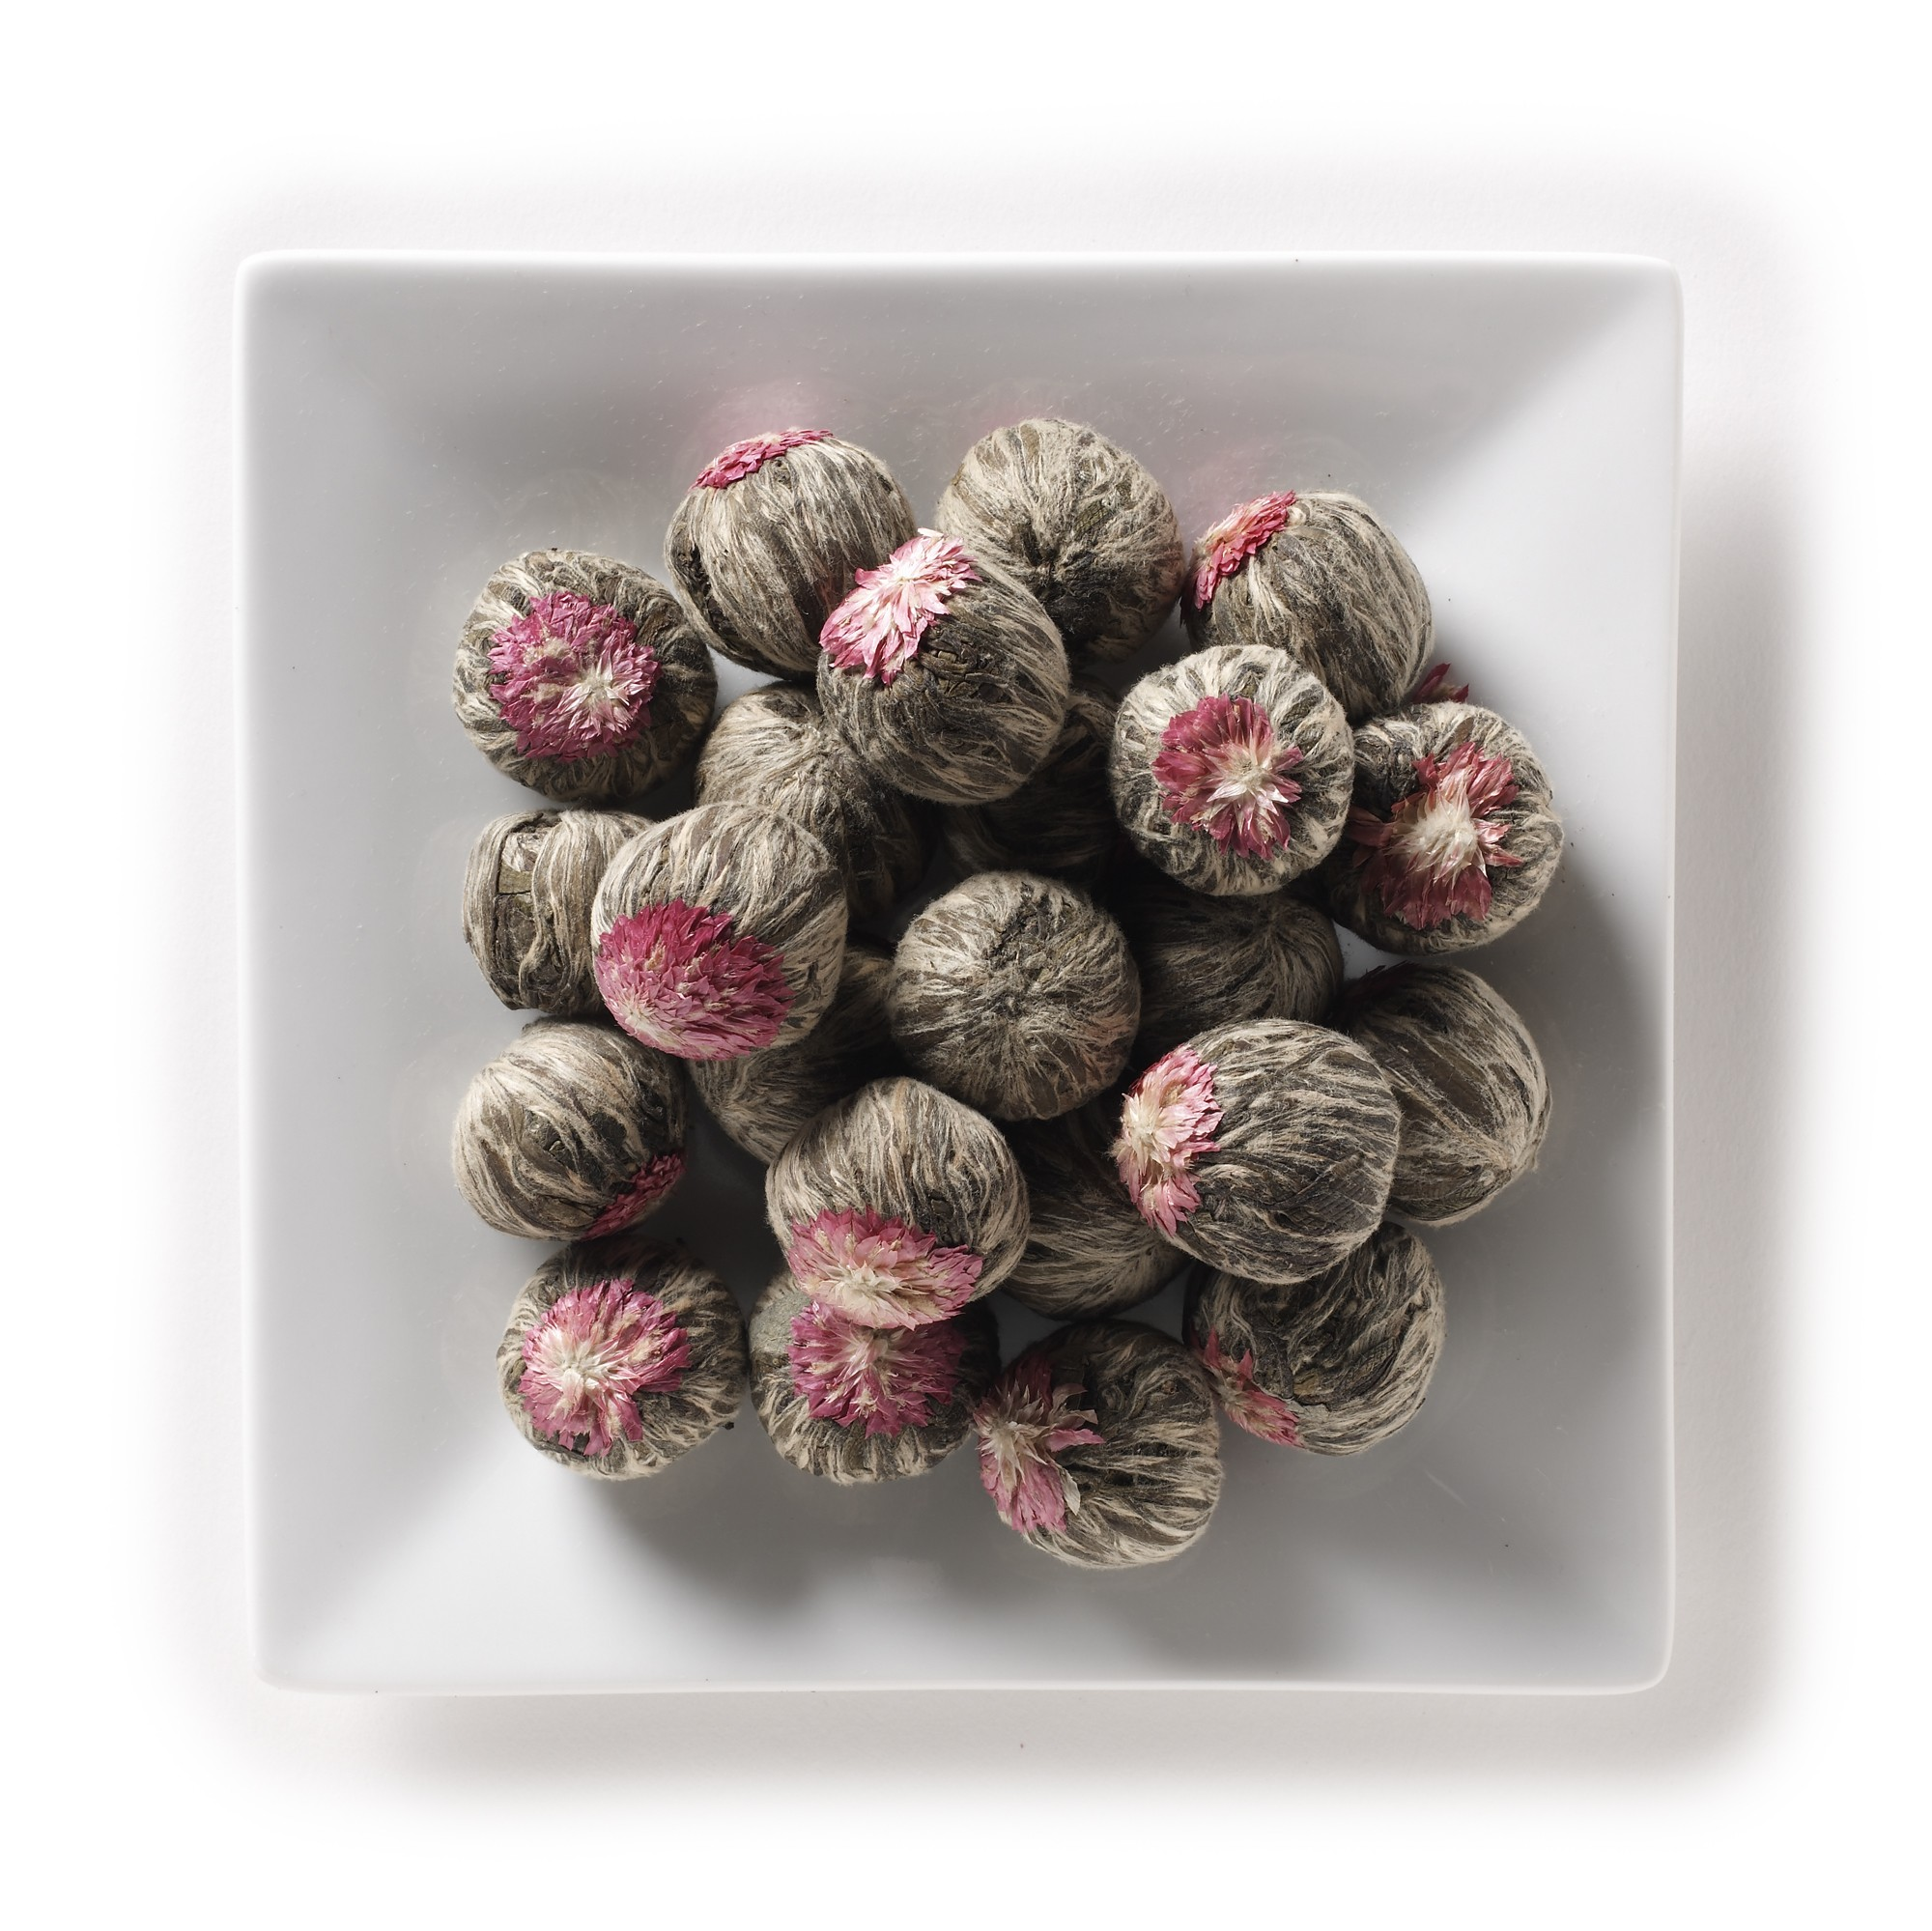 Lychee Nut Jasmine